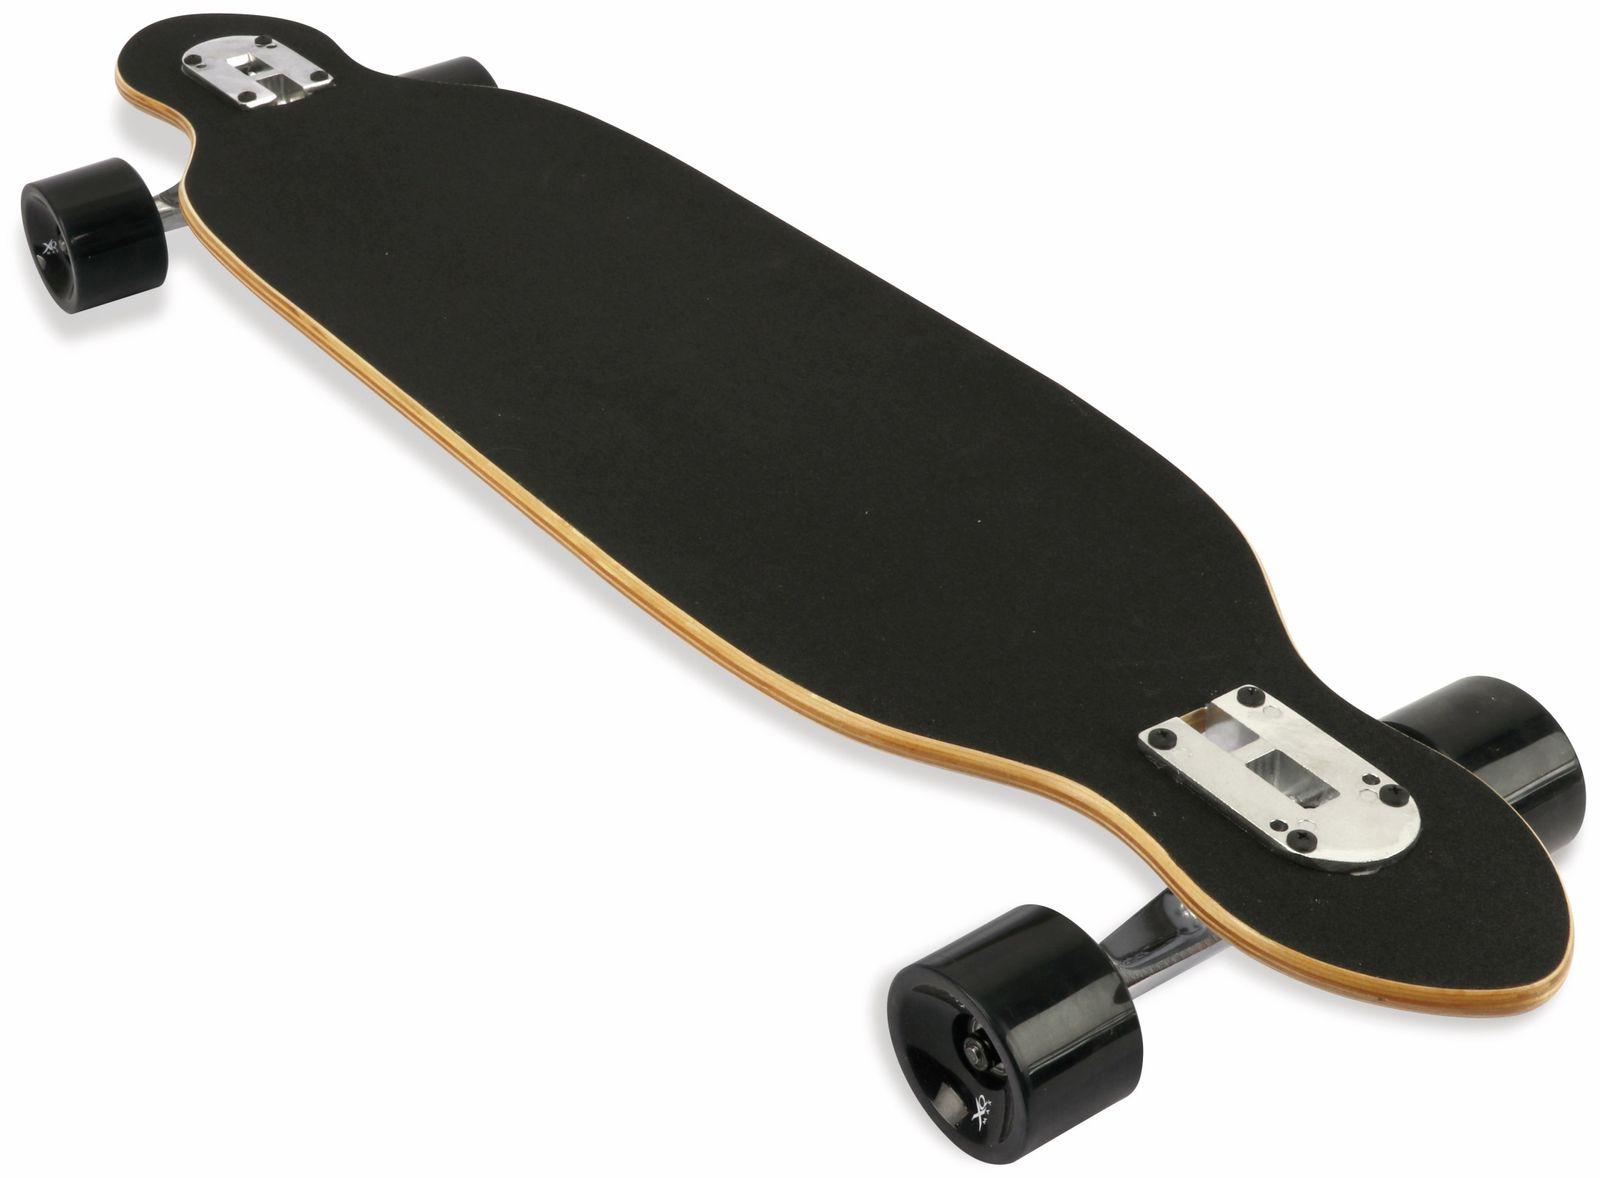 longboard xq max 128220680 96 cm schwarz wei online. Black Bedroom Furniture Sets. Home Design Ideas